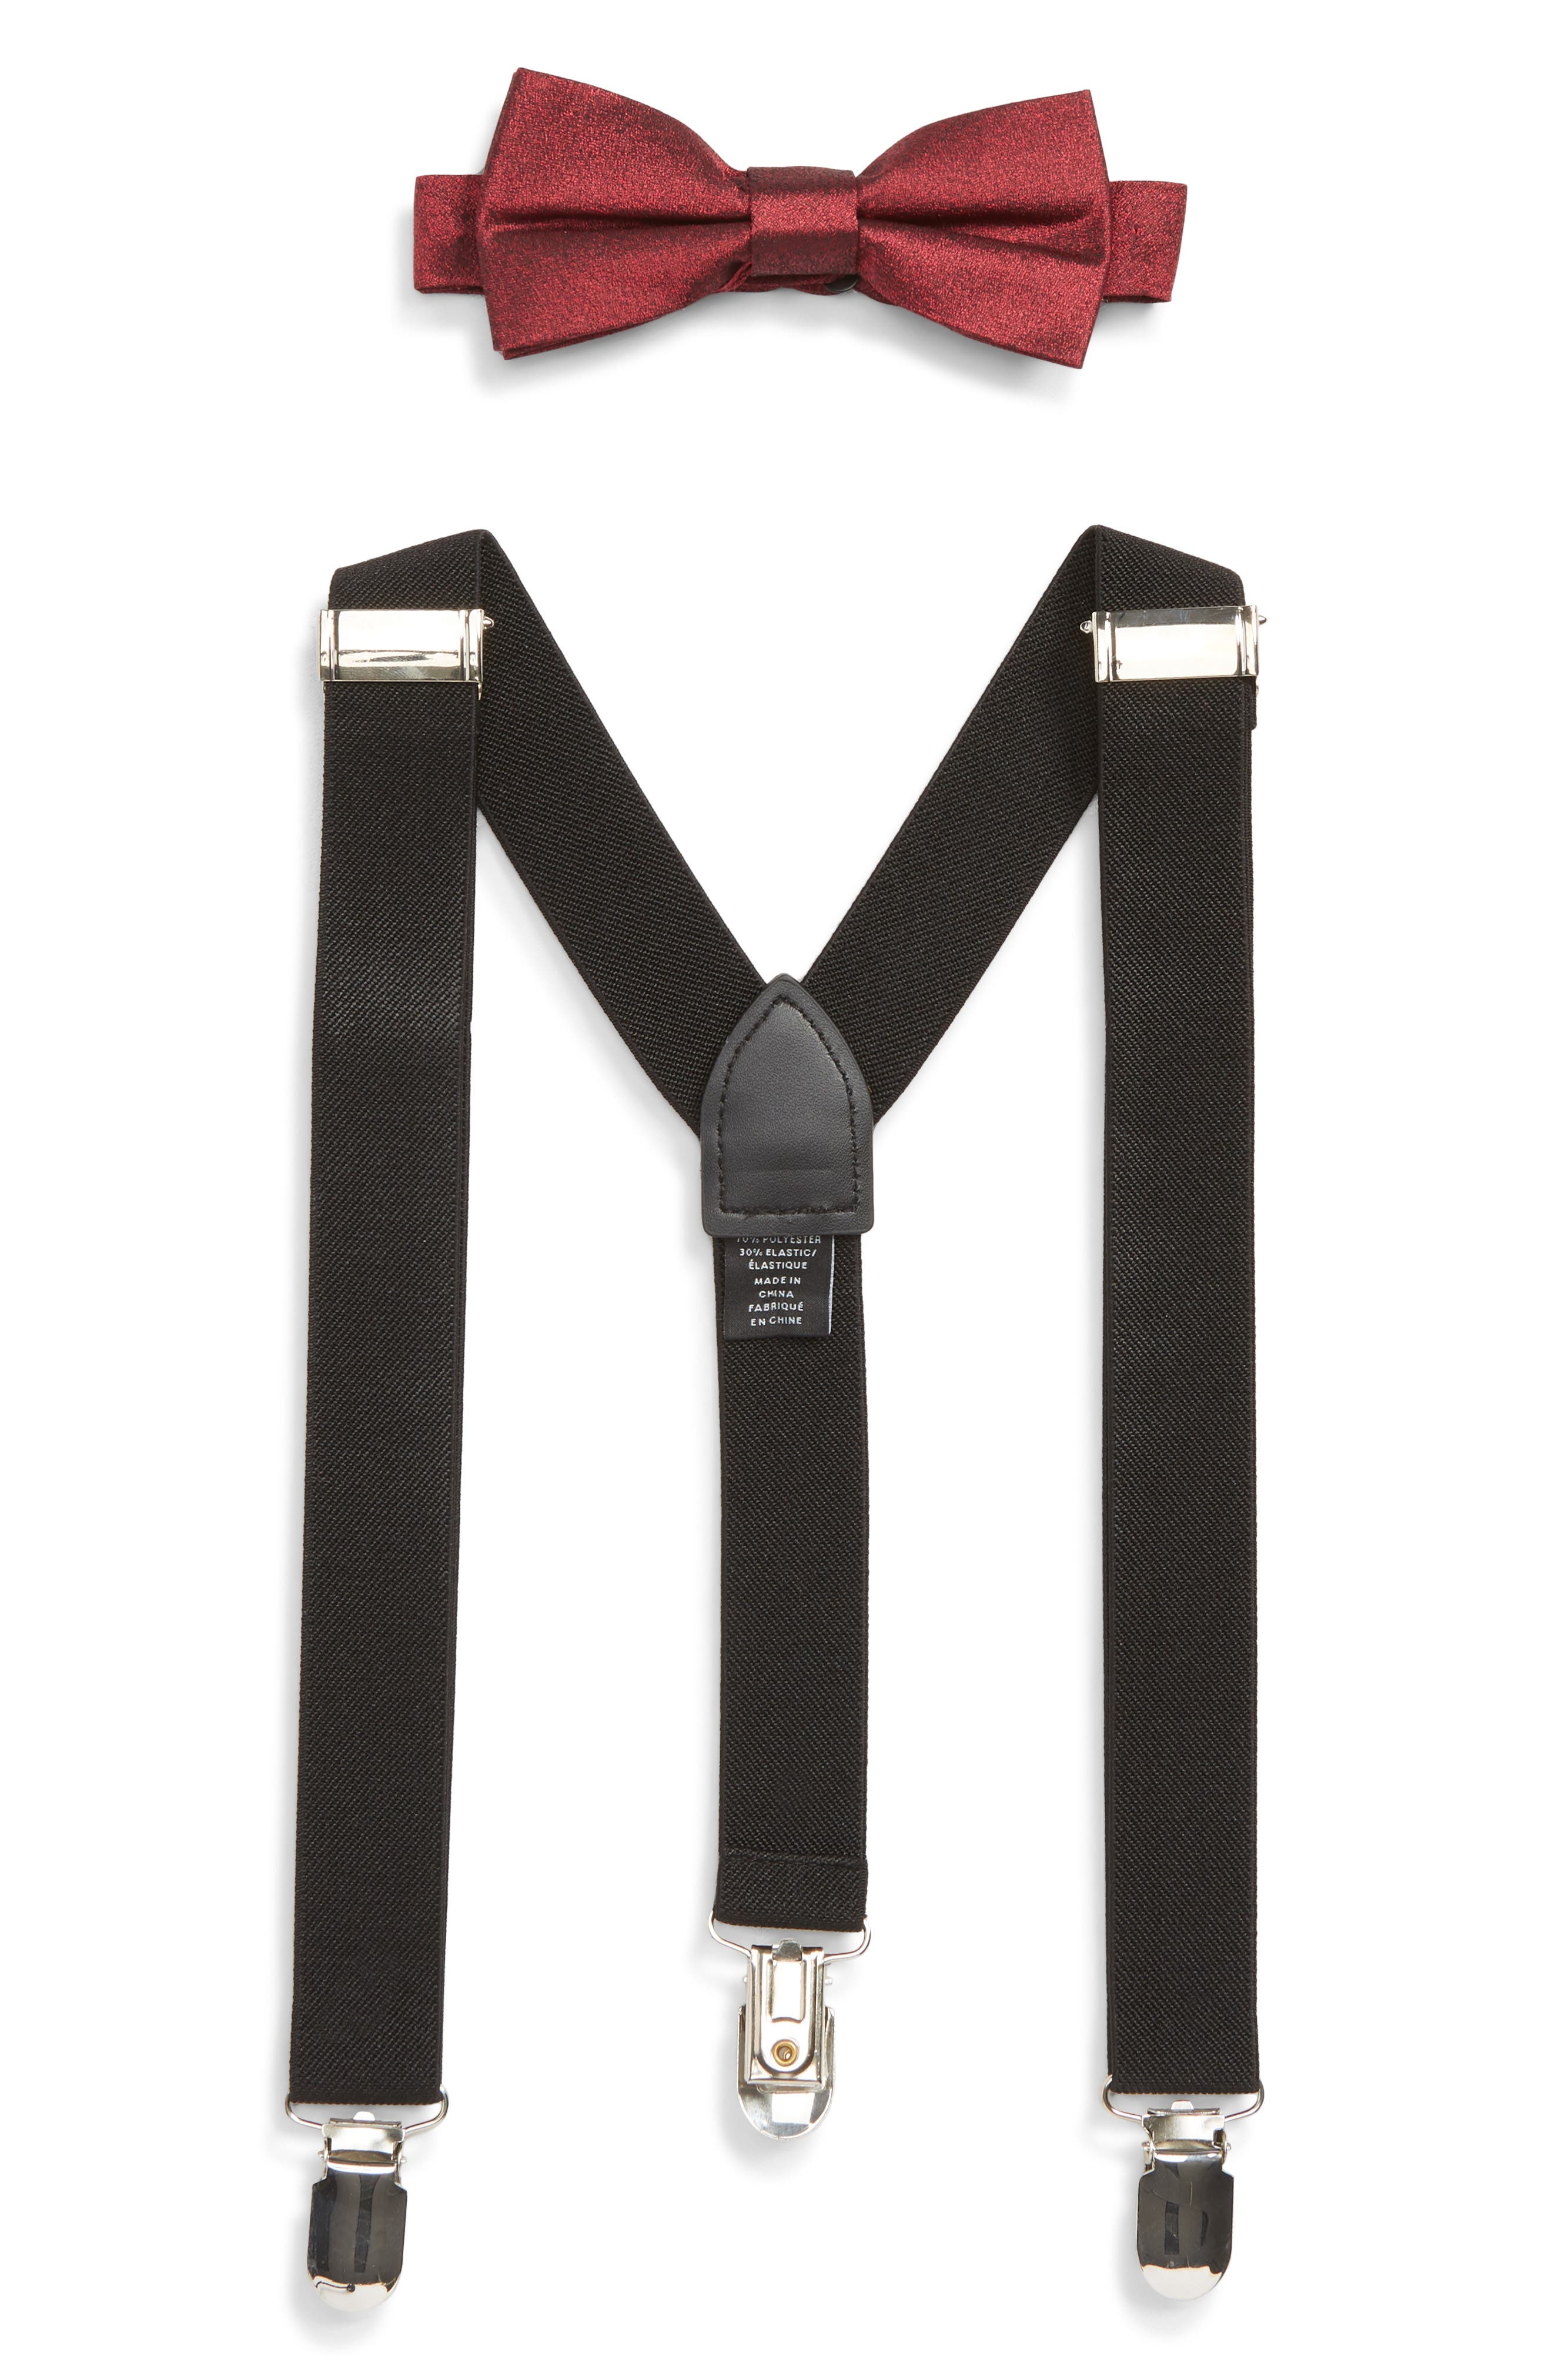 Solid Bow Tie & Suspender Set,                             Main thumbnail 1, color,                             BURGUNDY